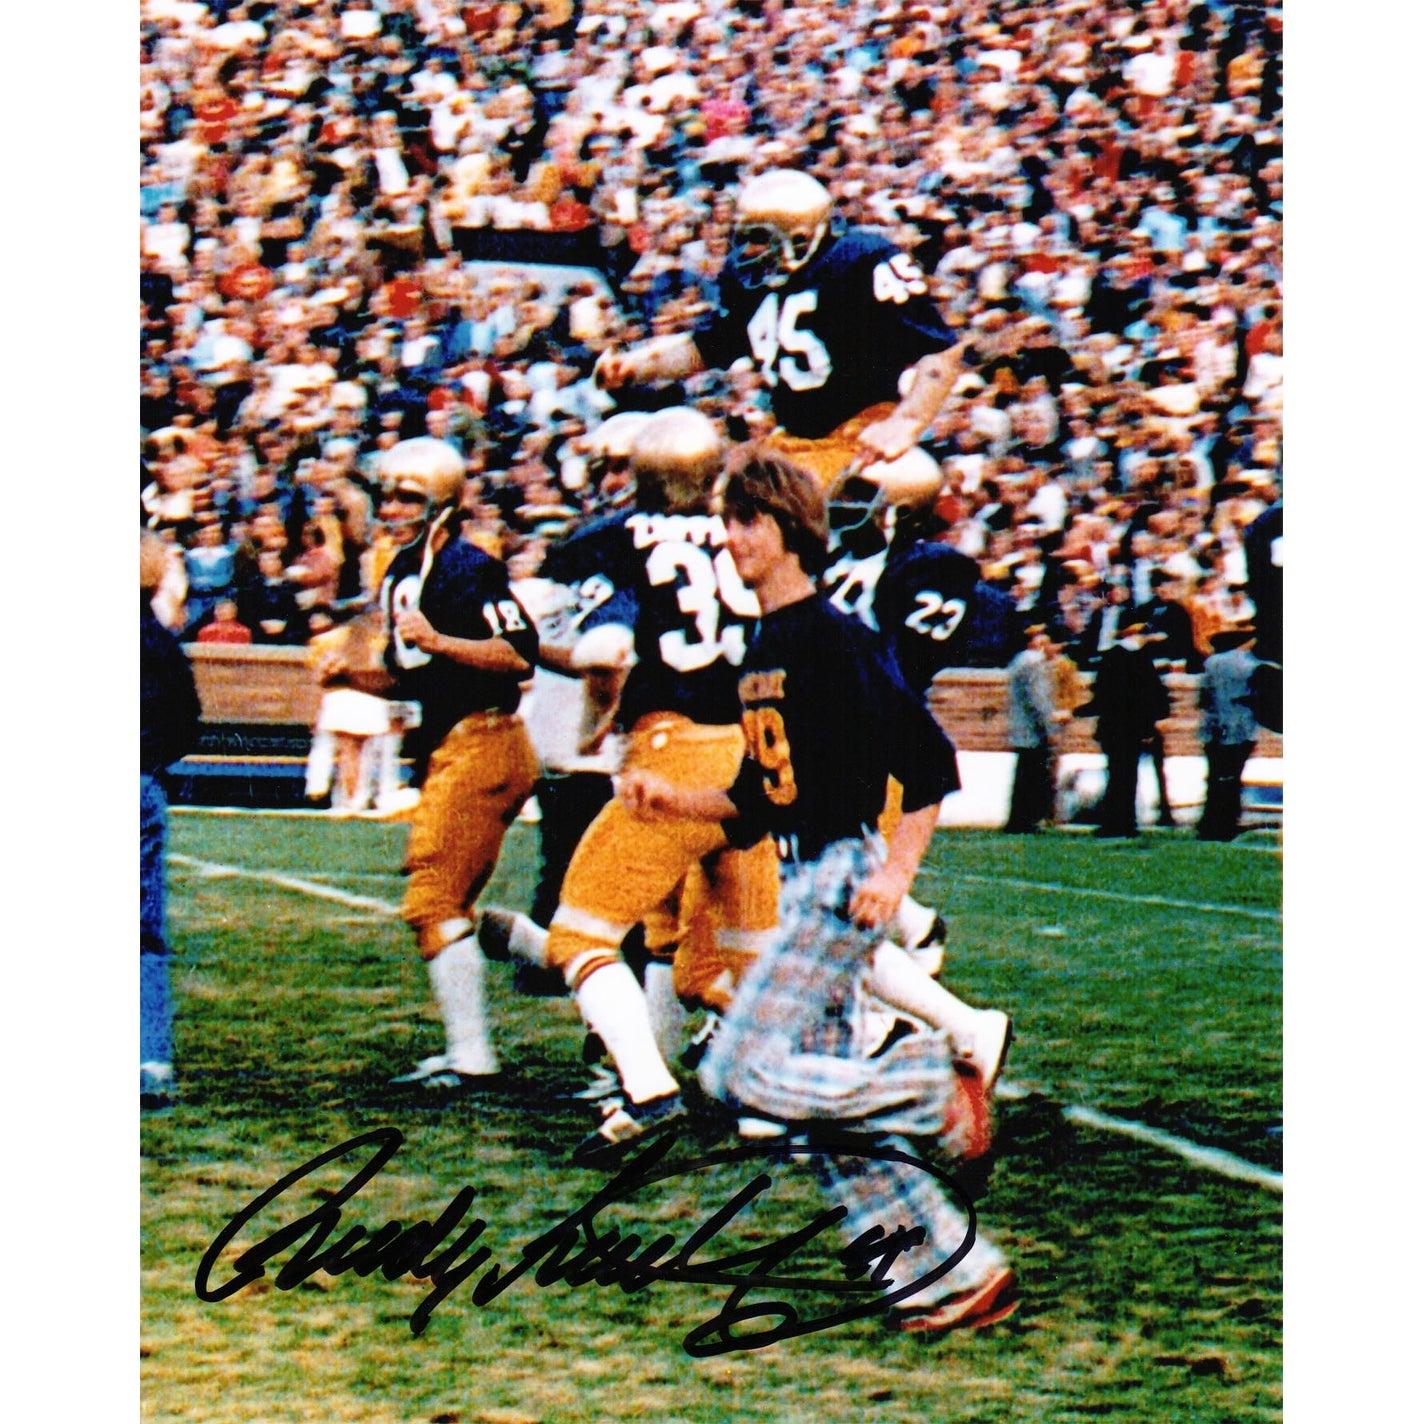 Shop Rudy Ruettiger Notre Dame Carried Off Football Field 8x10 Photo